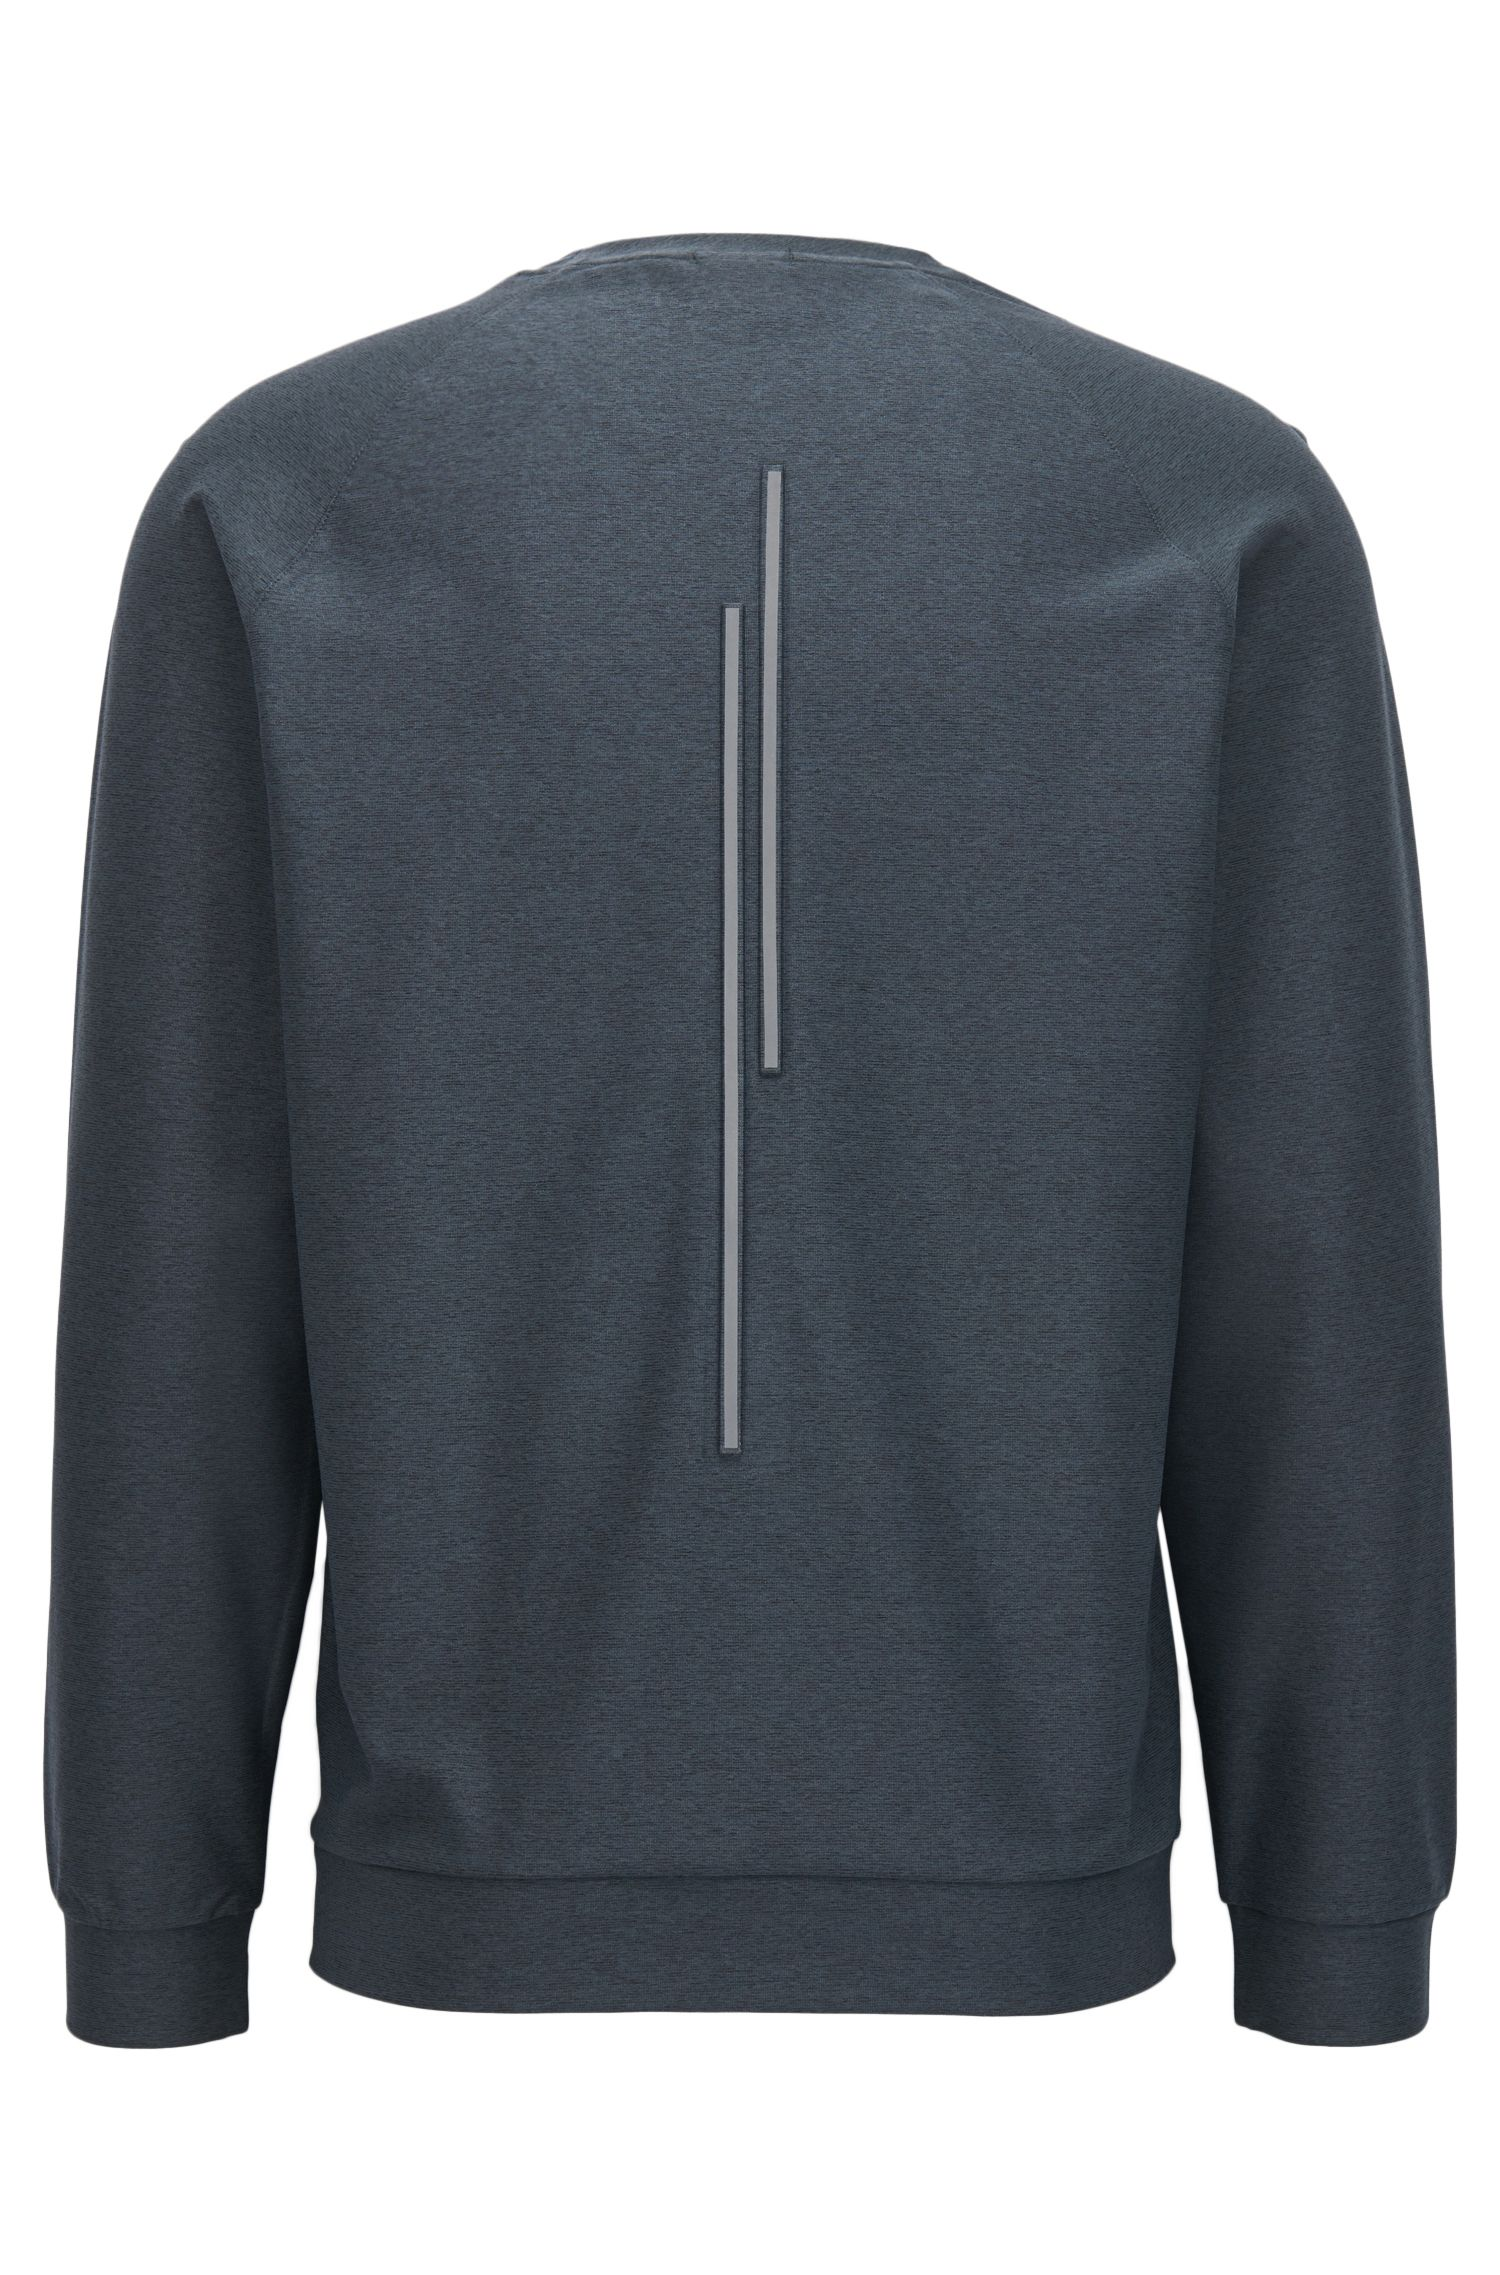 Active Stretch Shirt, Slim Fit | Salbo, Black